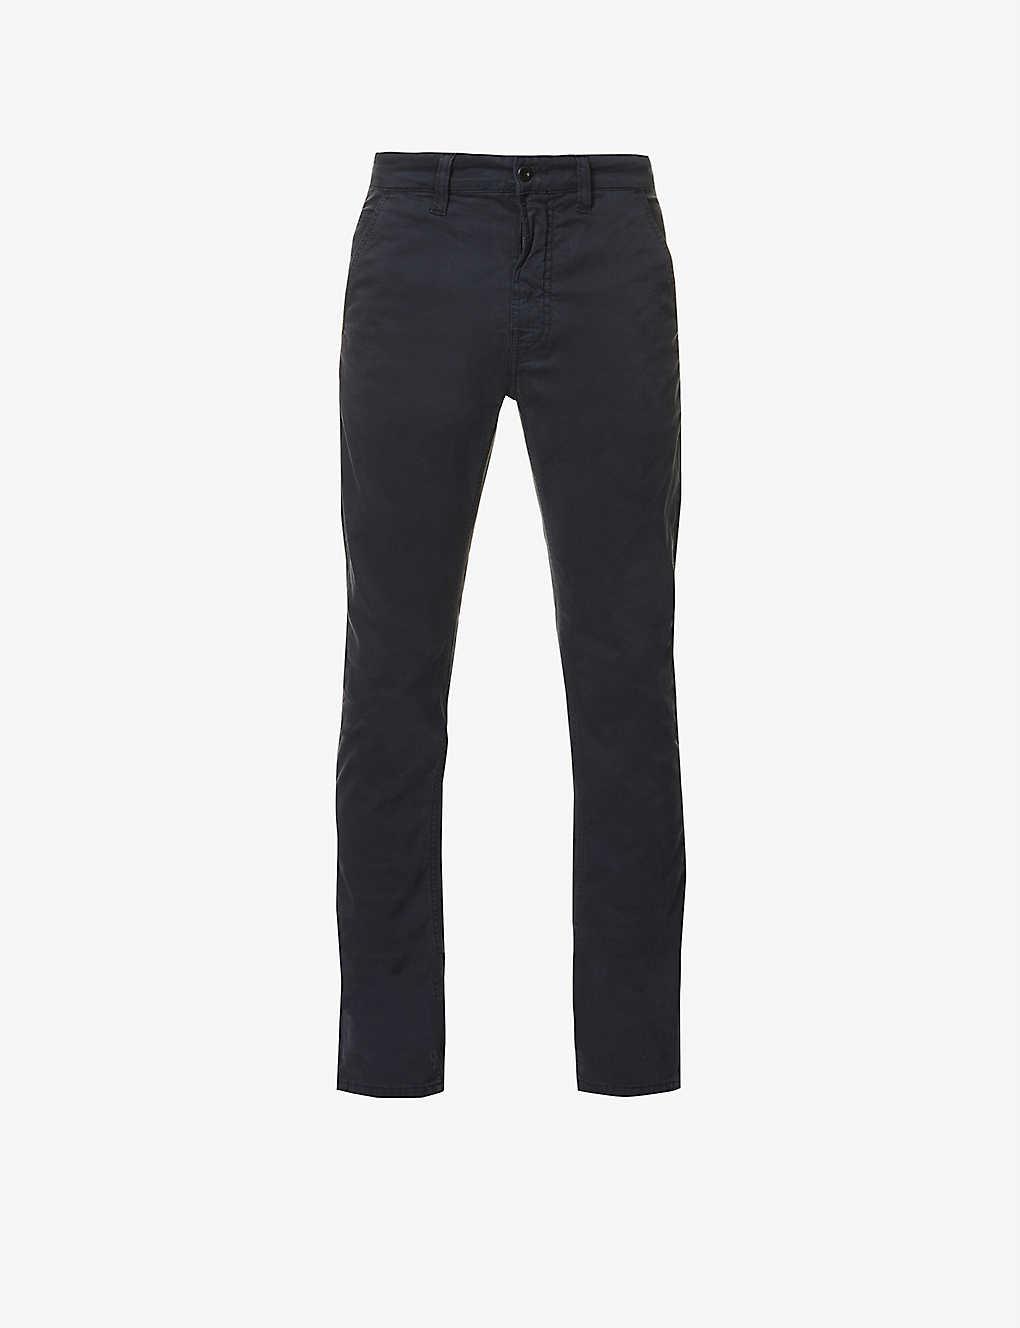 1b093b58bcc Slim Adam slim-fit tapered stretch-cotton chinos - Dk midnight ...